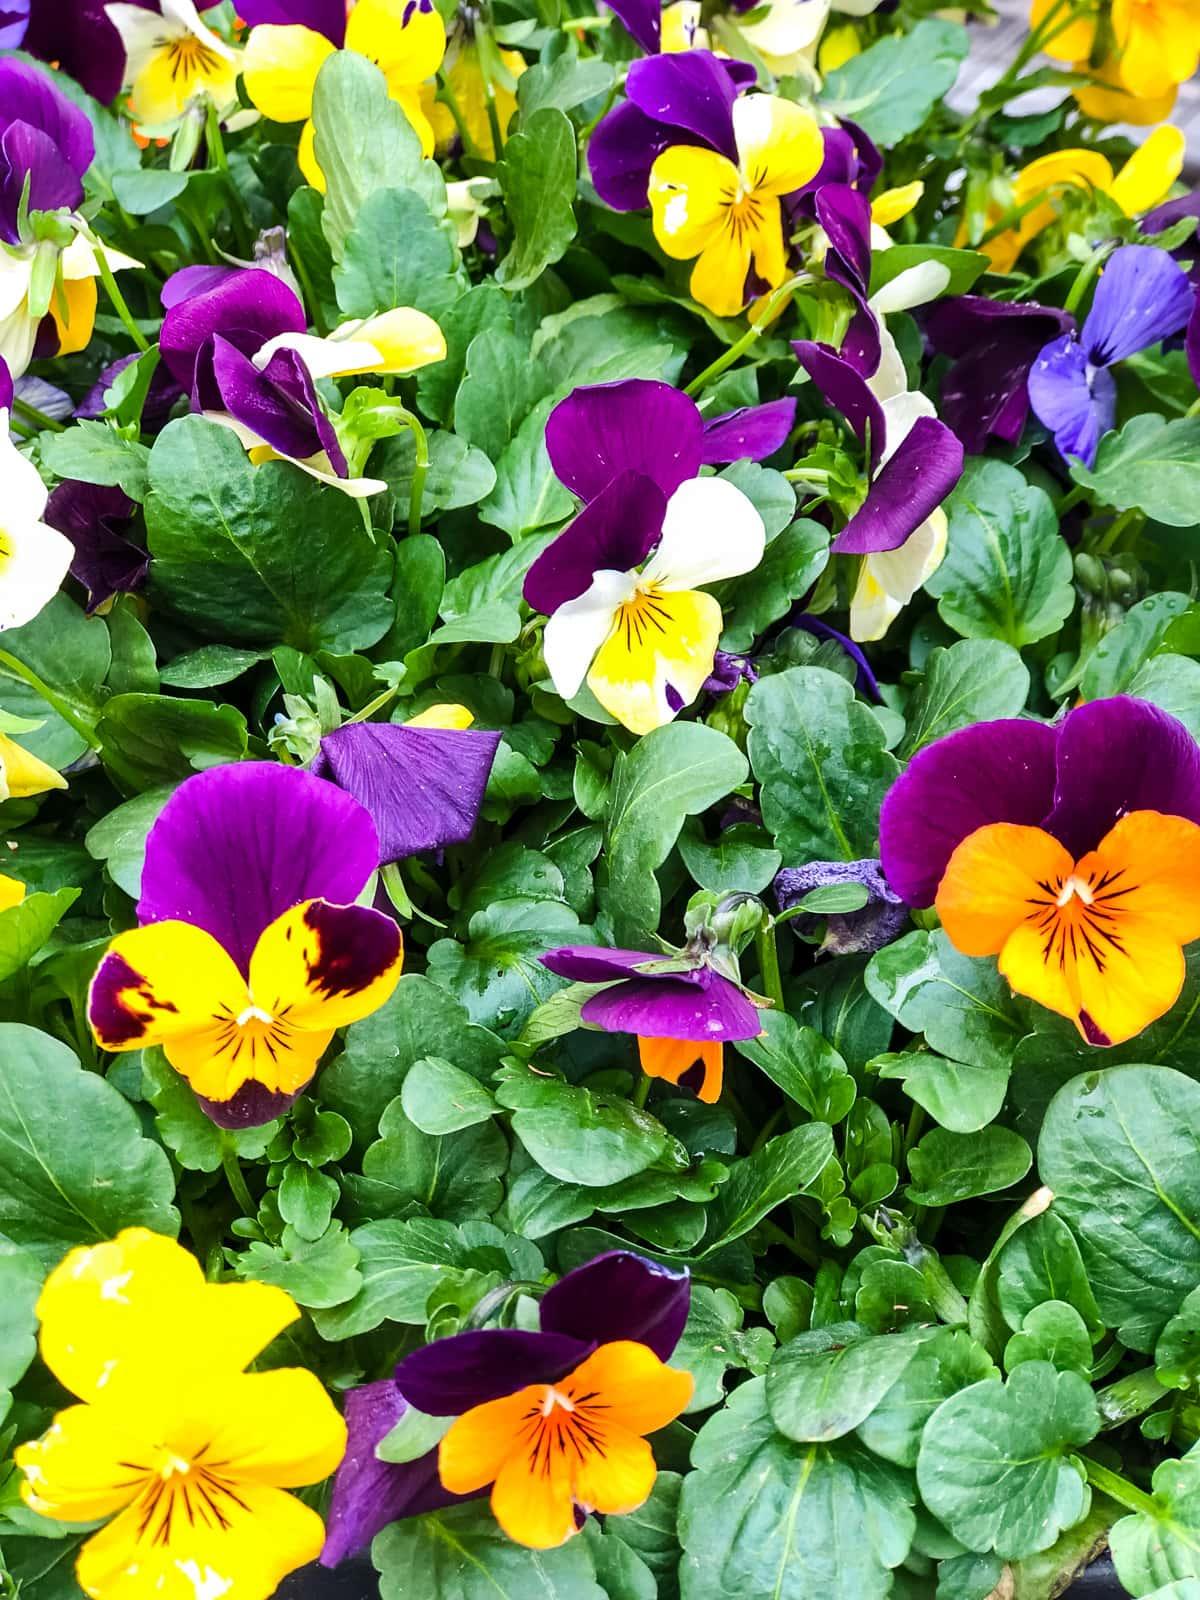 Planting an Edible Flower Garden: Pansies